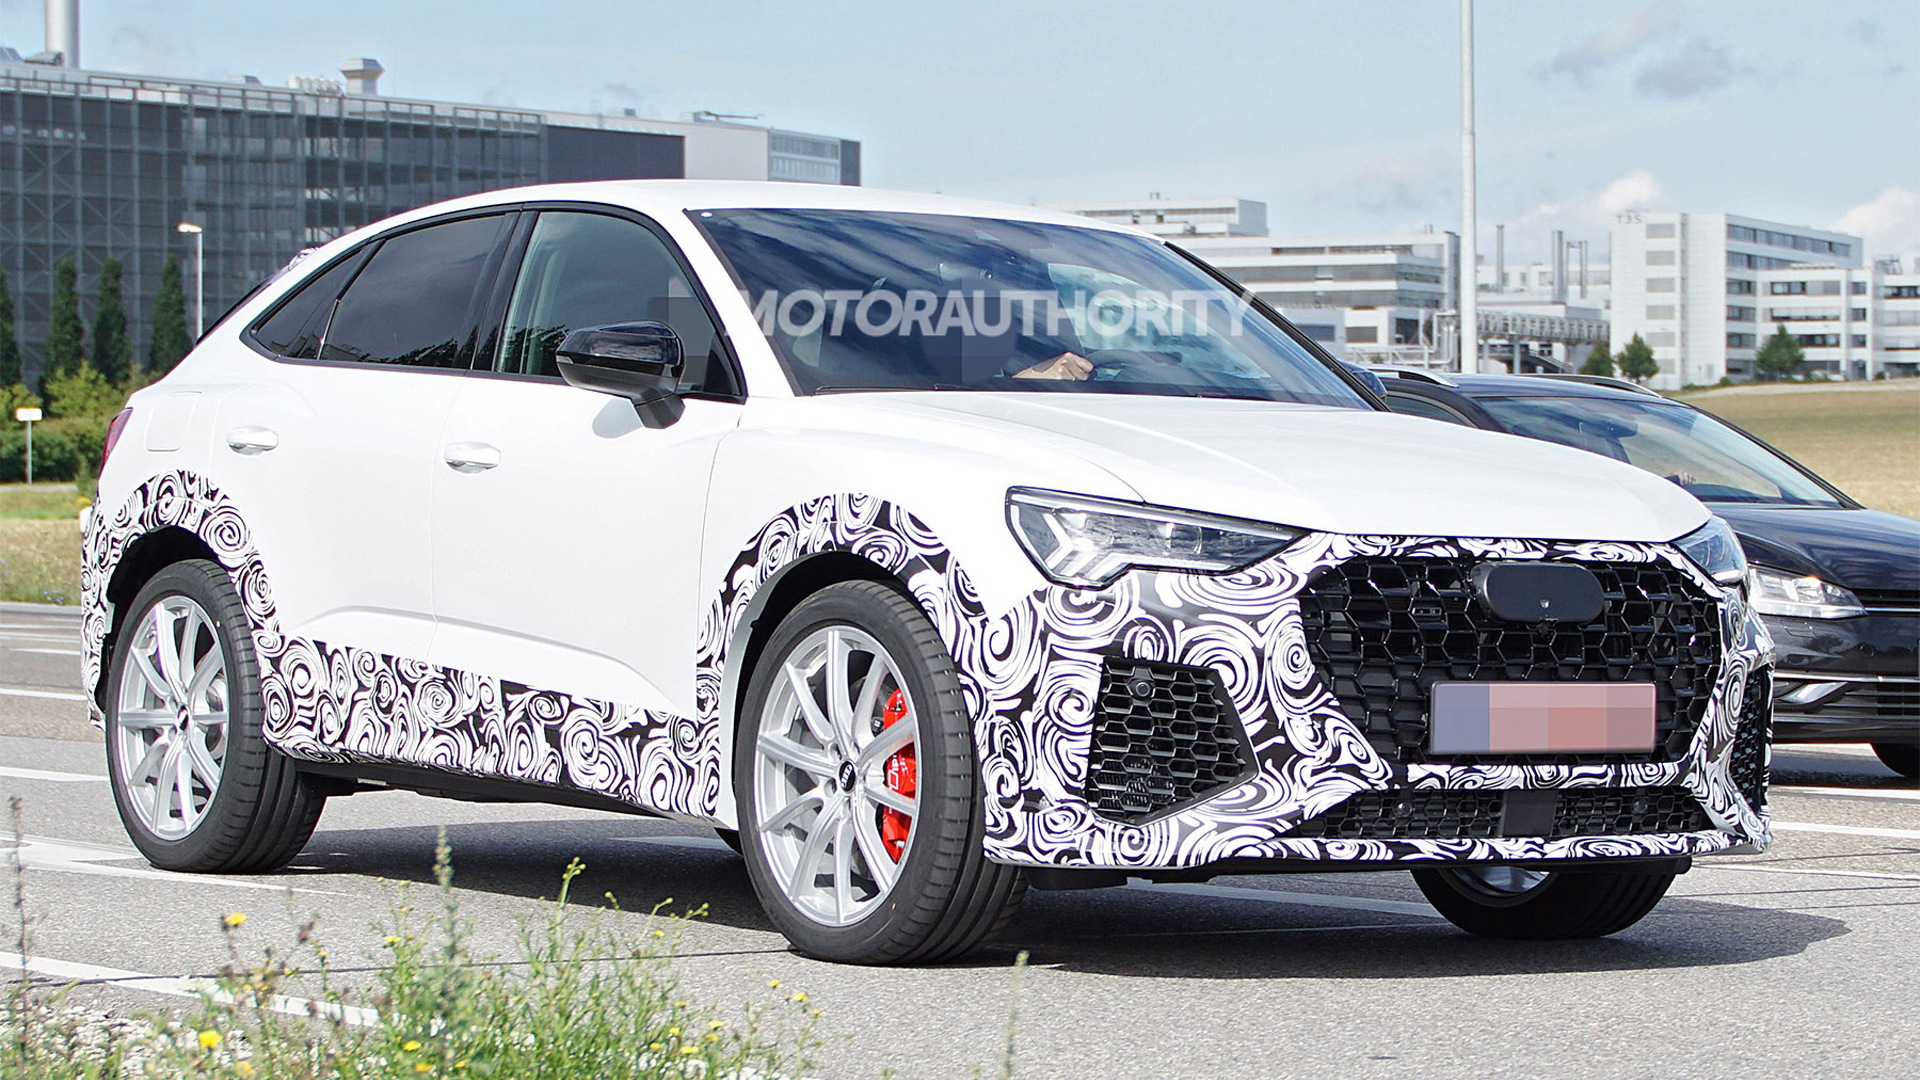 2020 Audi RS Q3 Sportback spy shots - Photo credit: S. Baldauf/SB-Medien